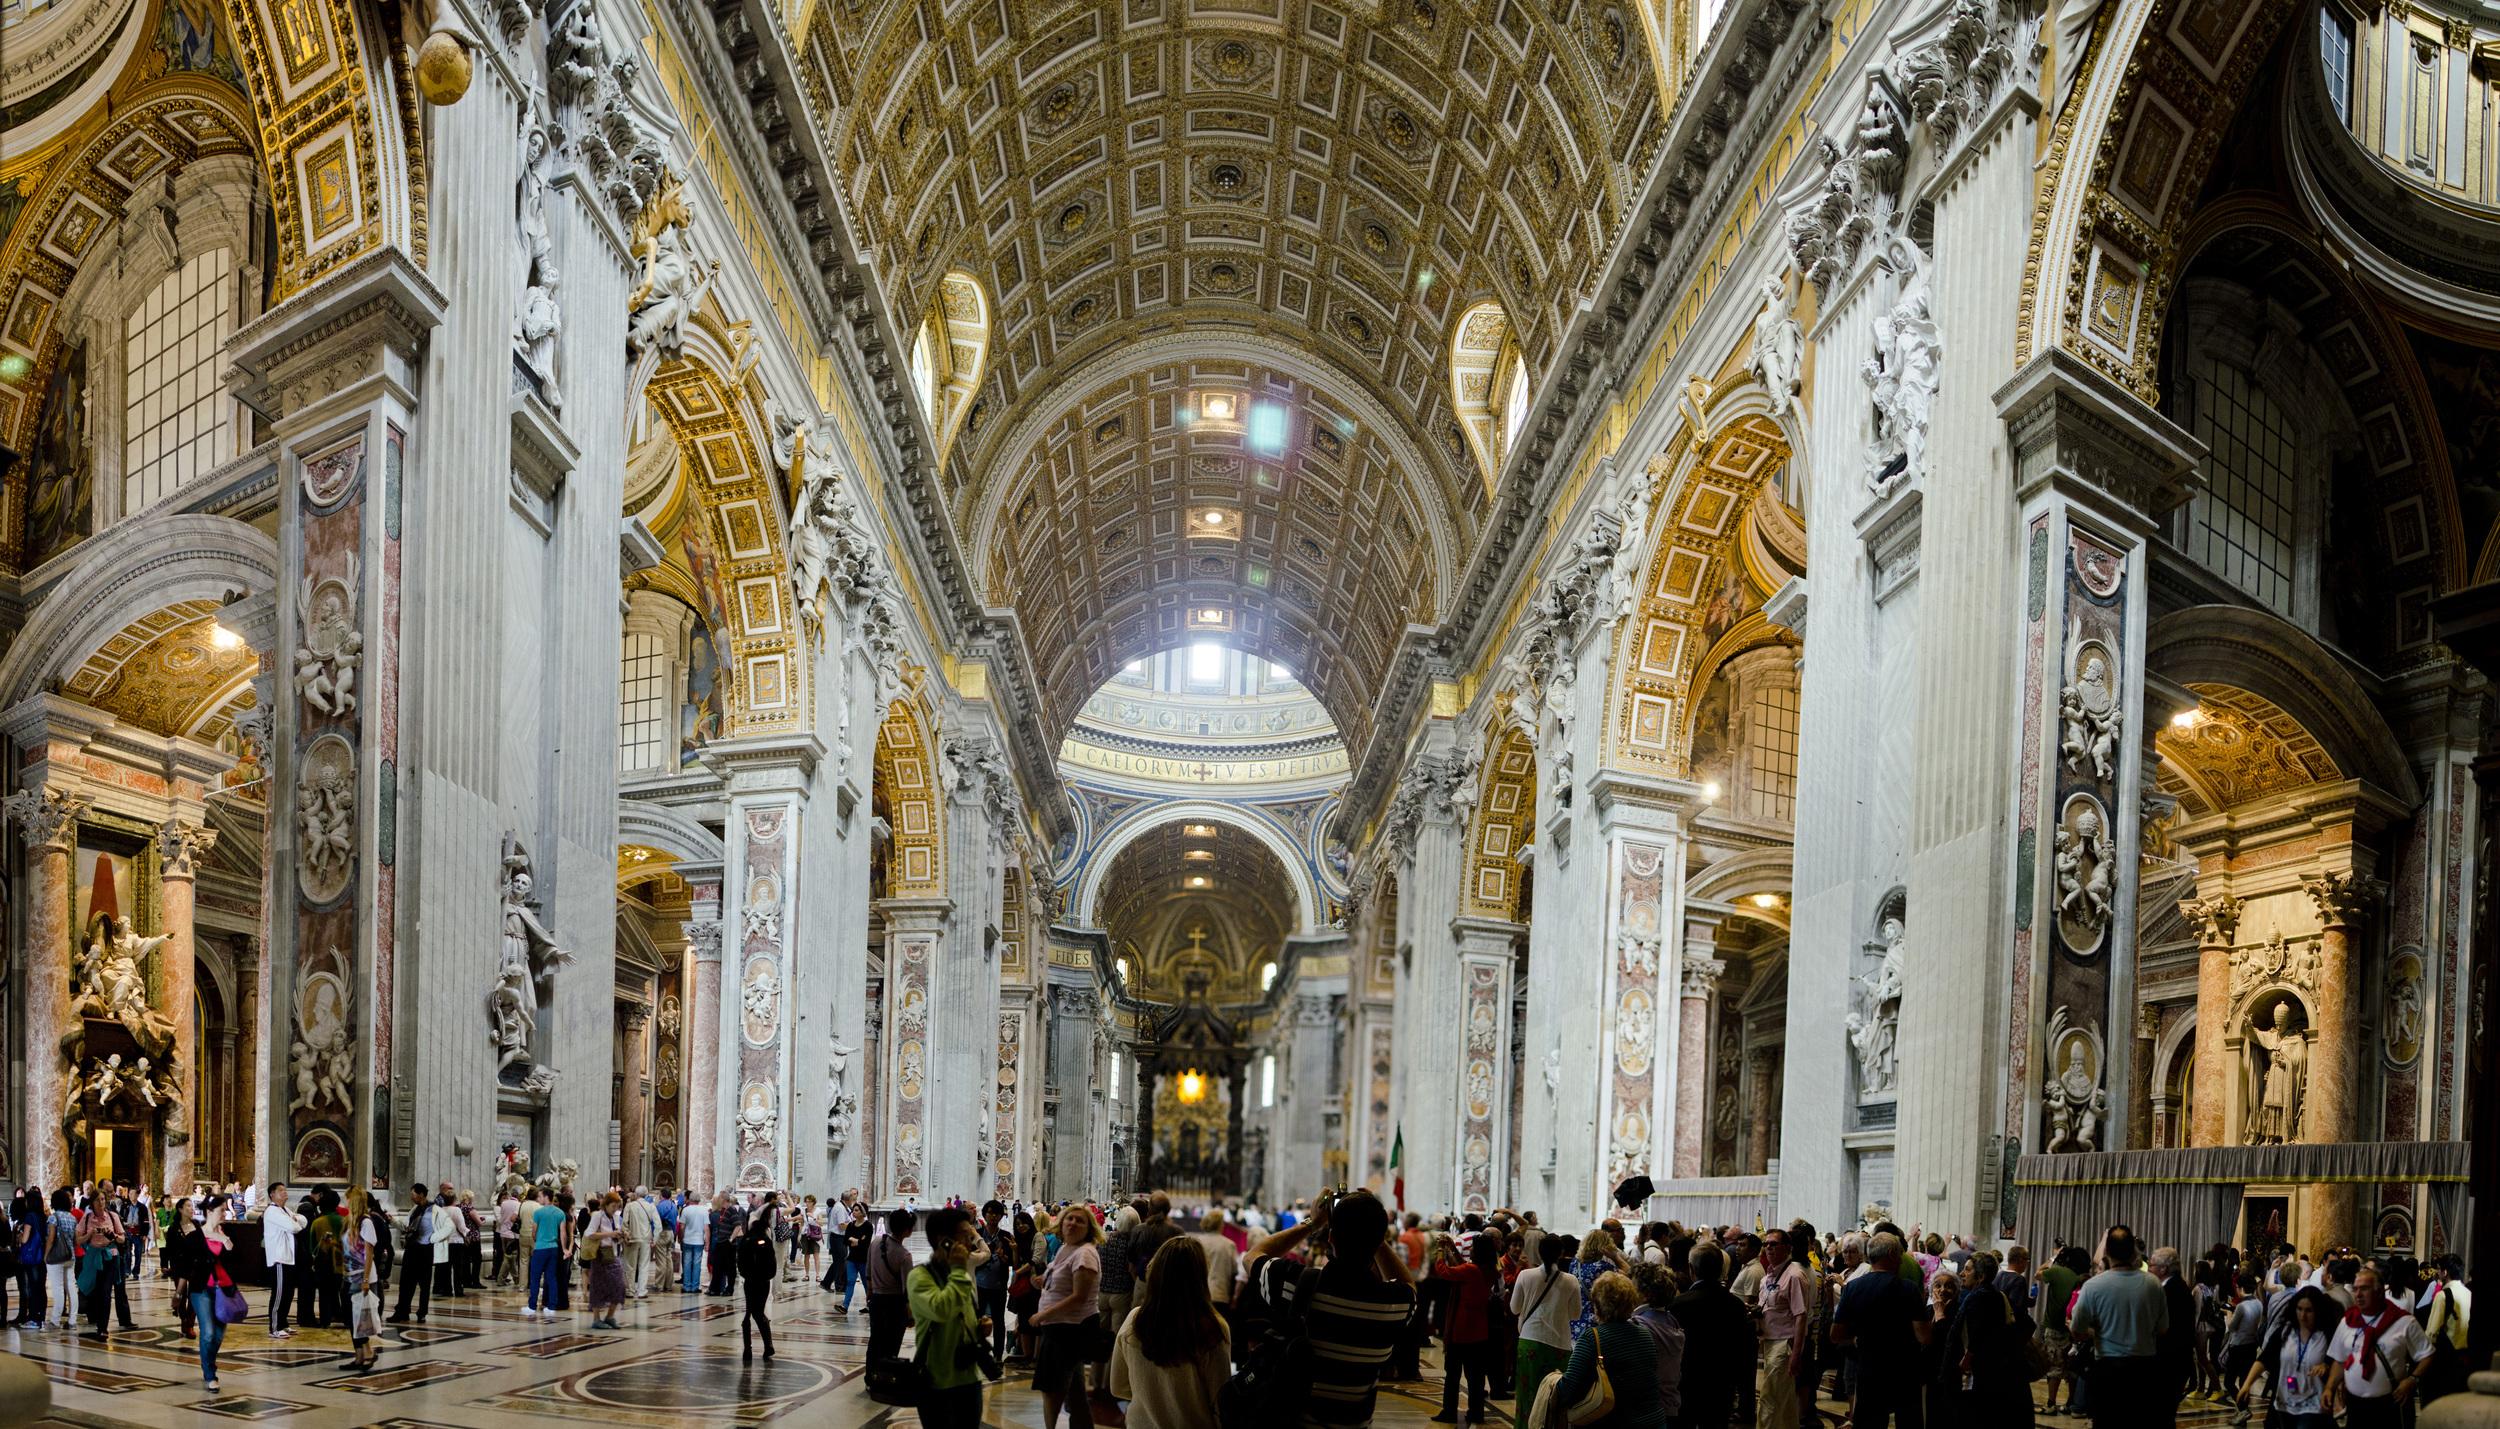 St_Peter's_Basilica_Interior_Panorama1_small.jpg